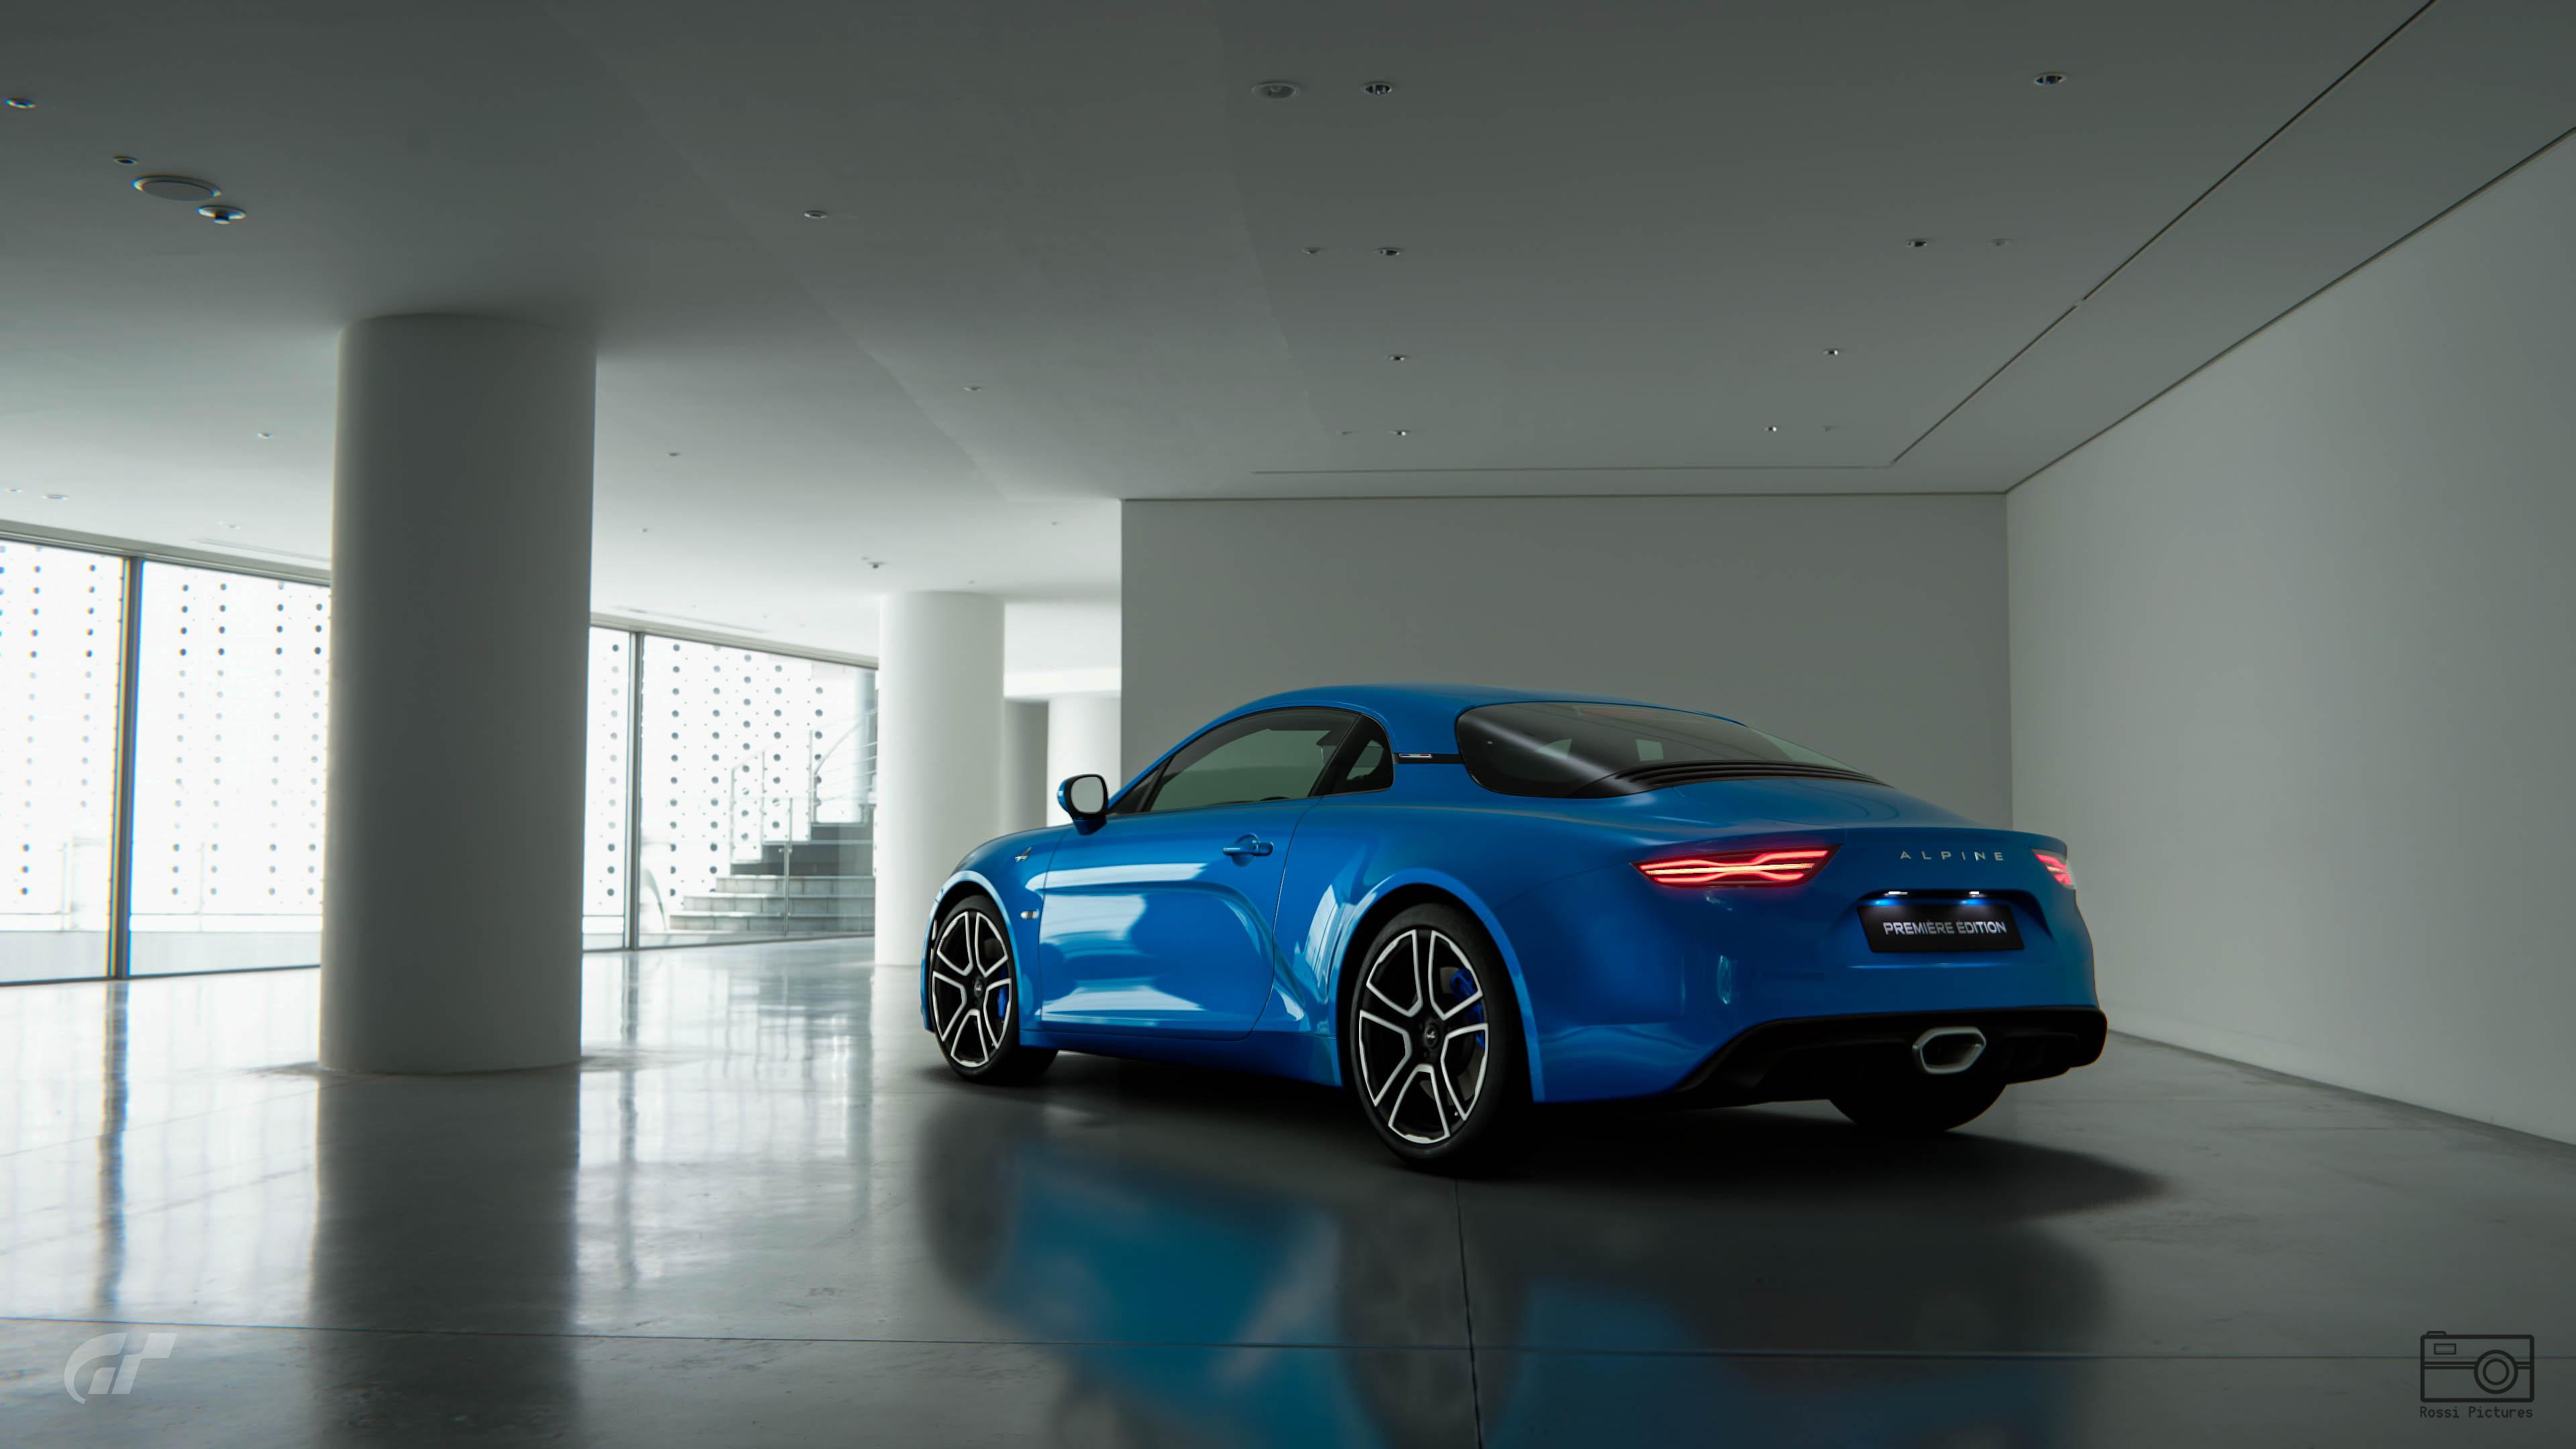 46340312864_9d8f6ec85f_o ForzaMotorsport.fr